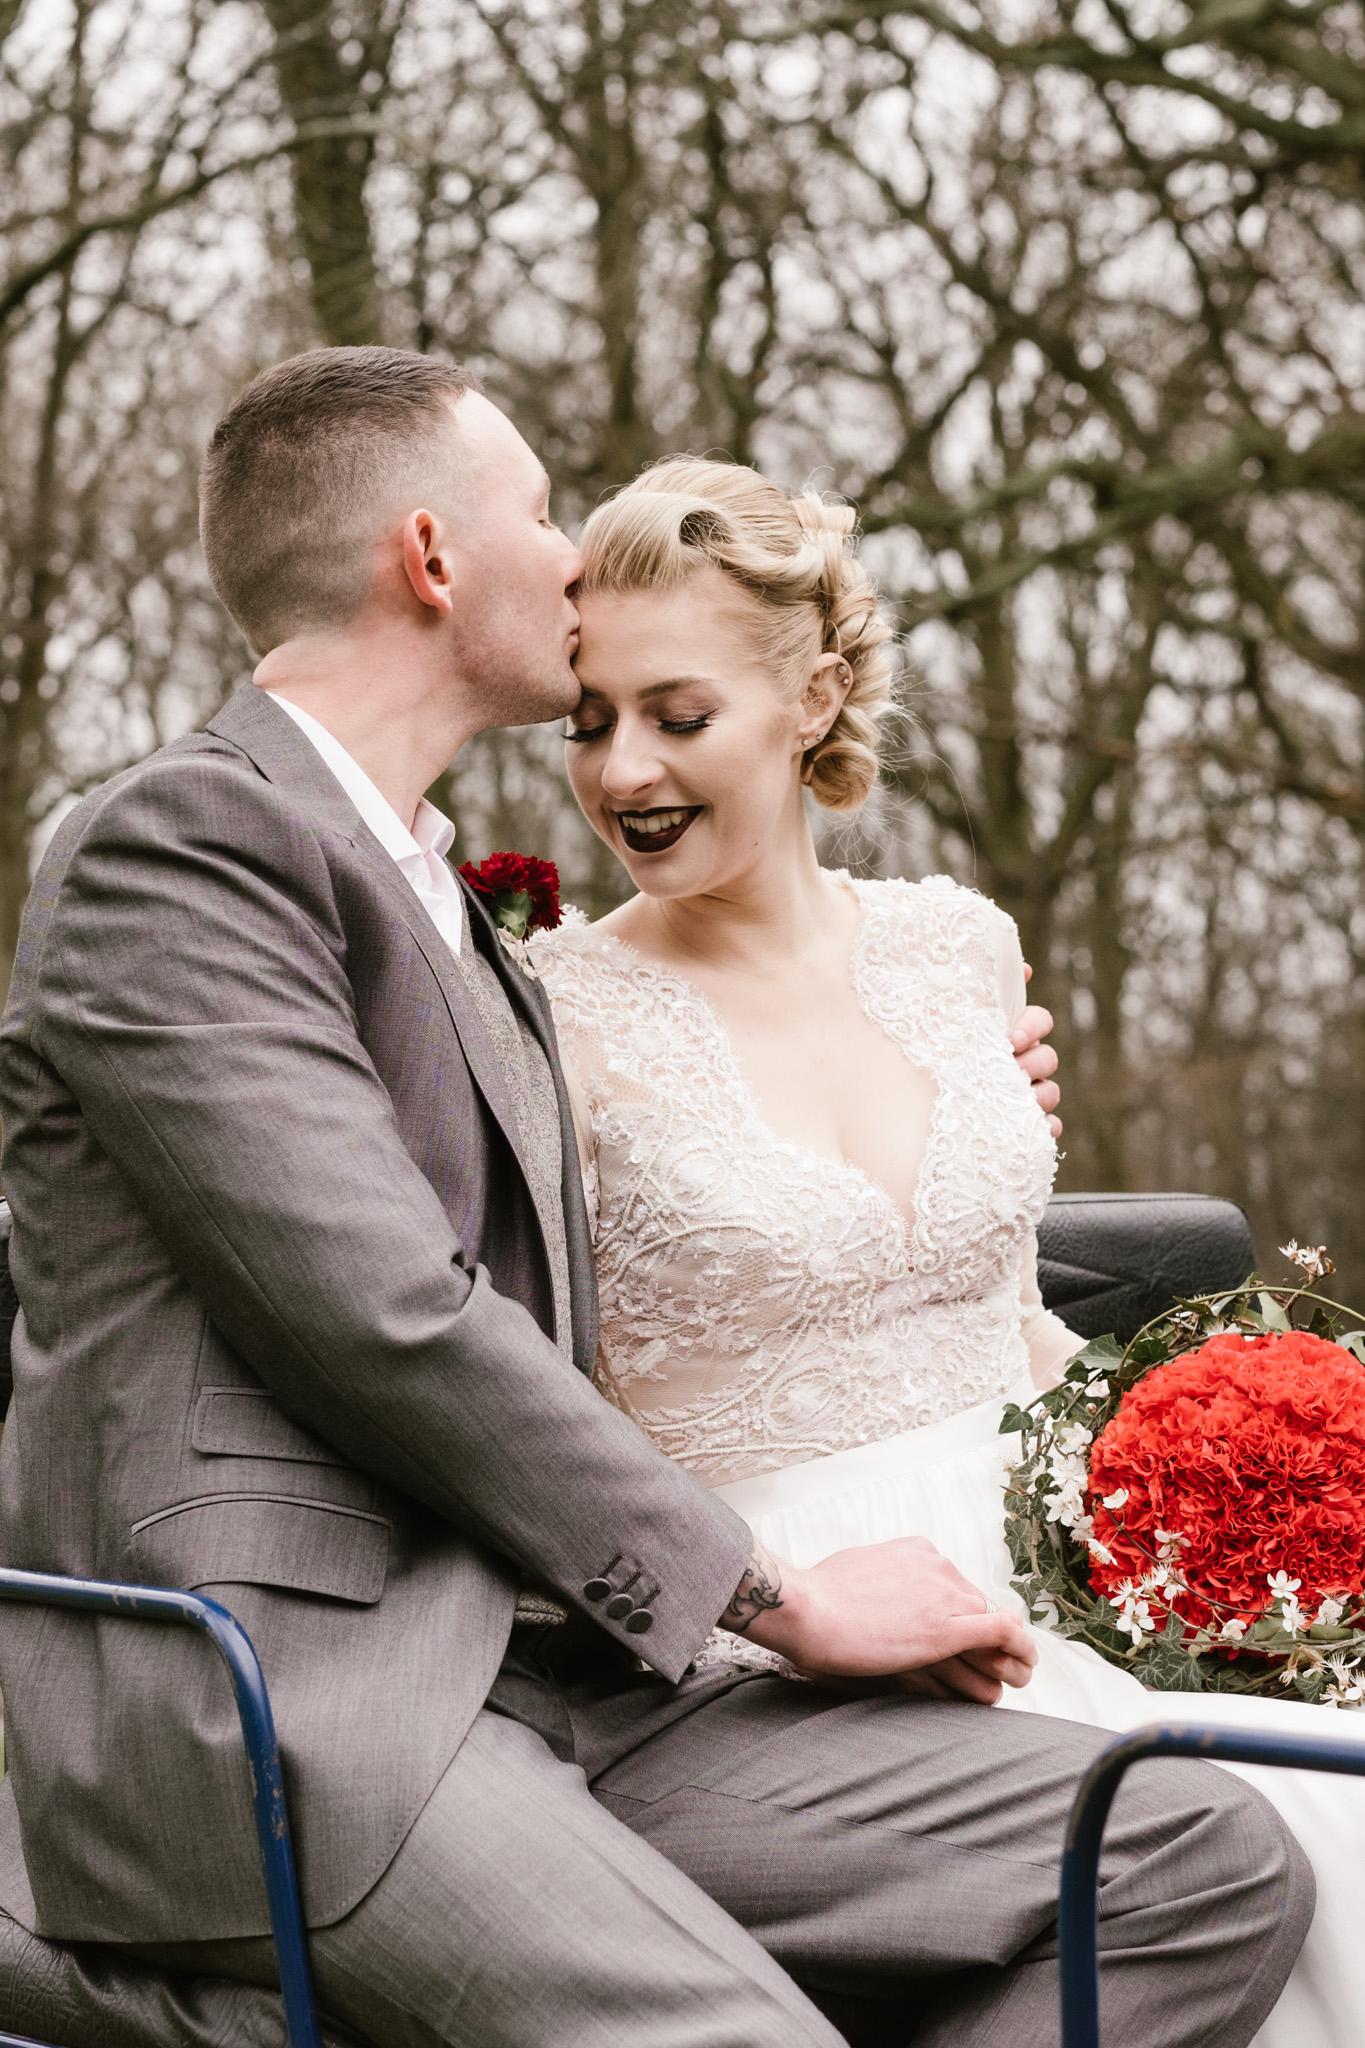 Captains-Wood-Barn-Alterative-Rustic-Vintage-Essex-Wedding-Suffolk-Grace-Elizabeth-7.jpg